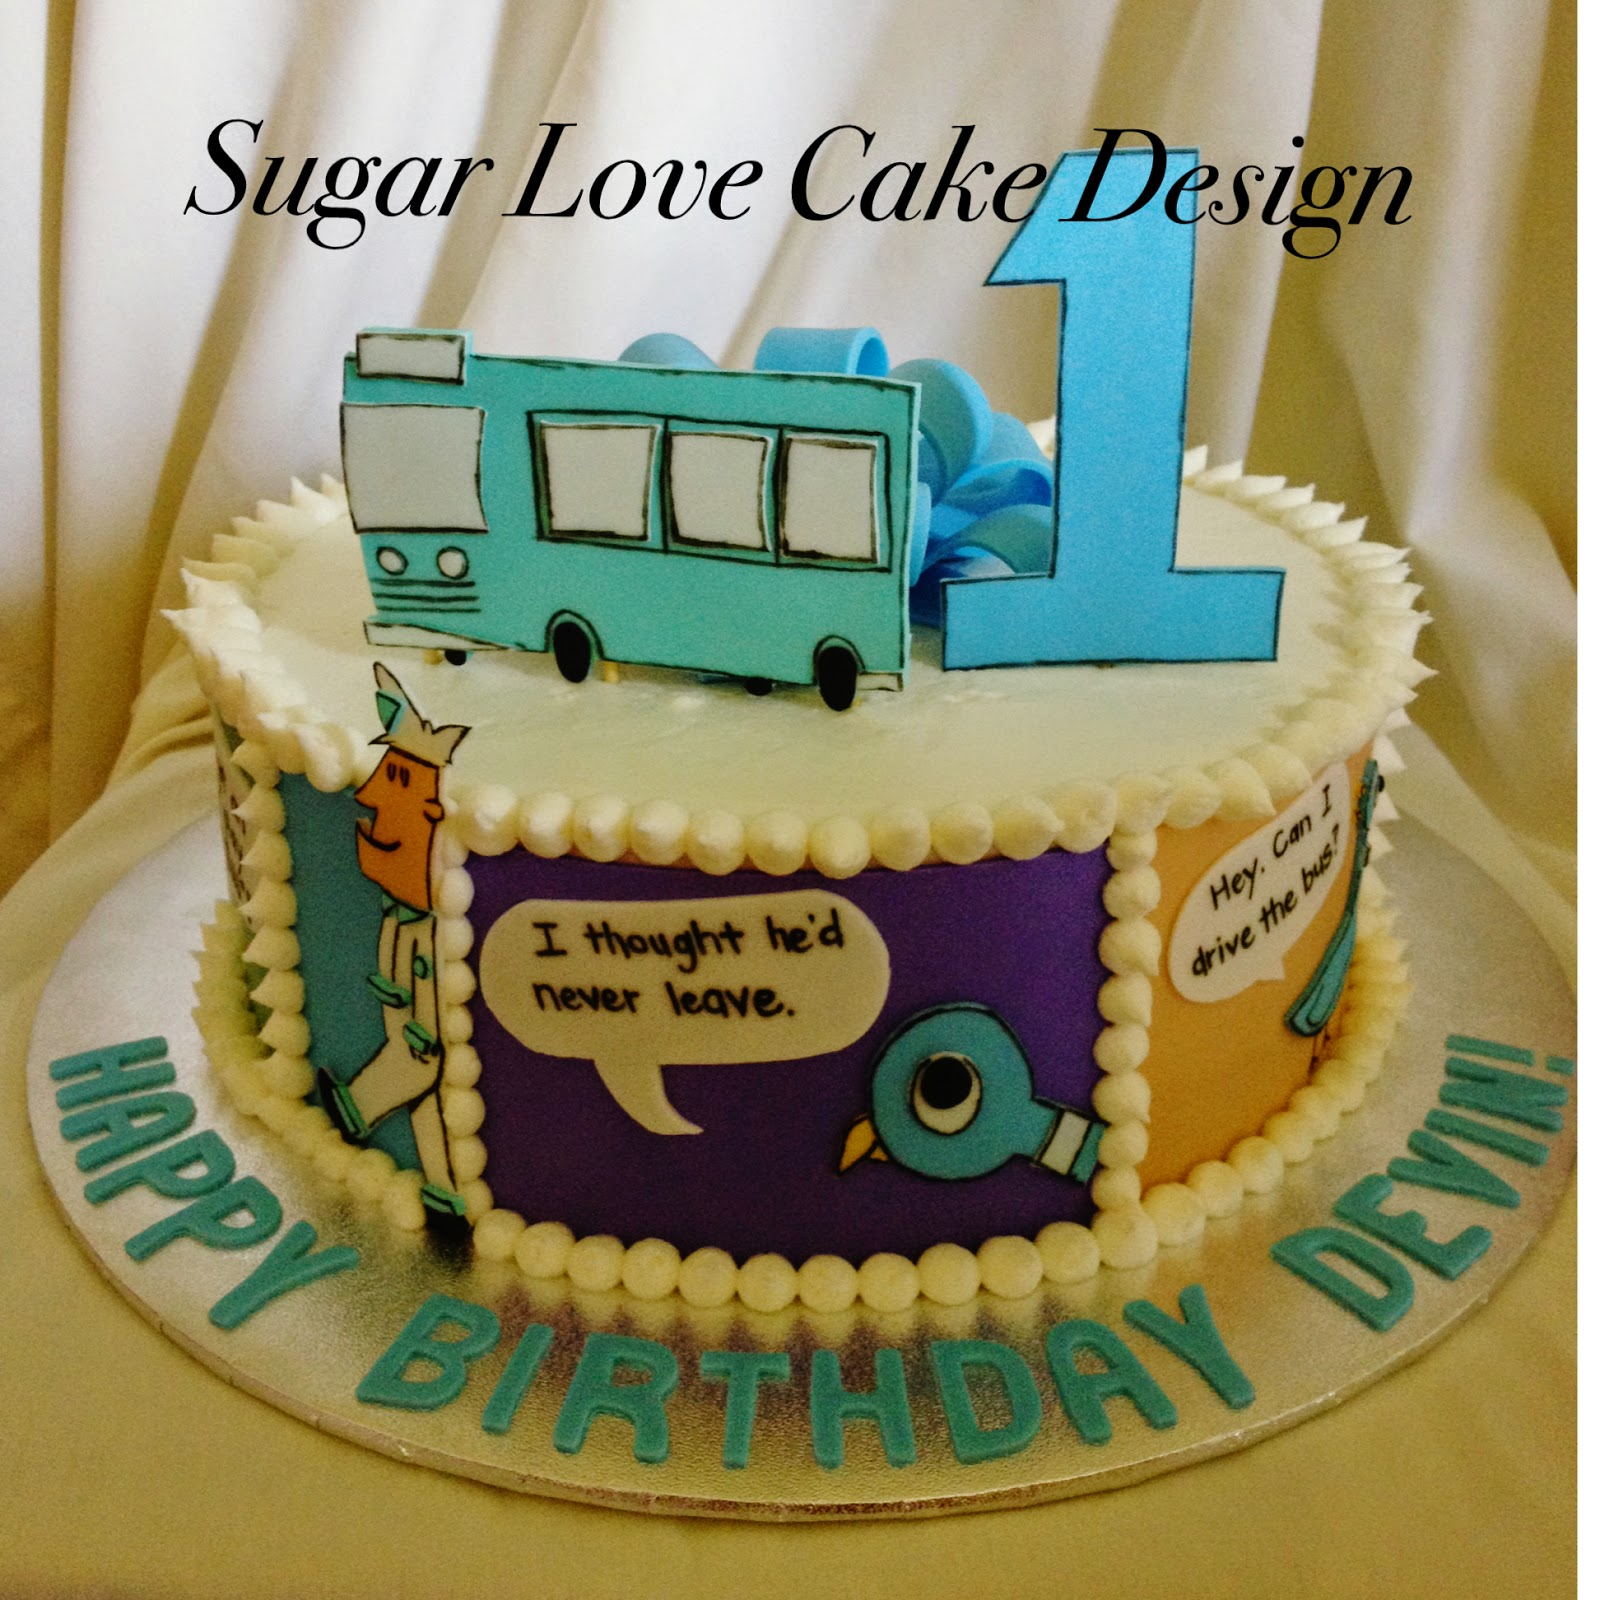 Sugar Love Cake Design: Birthday Cakes